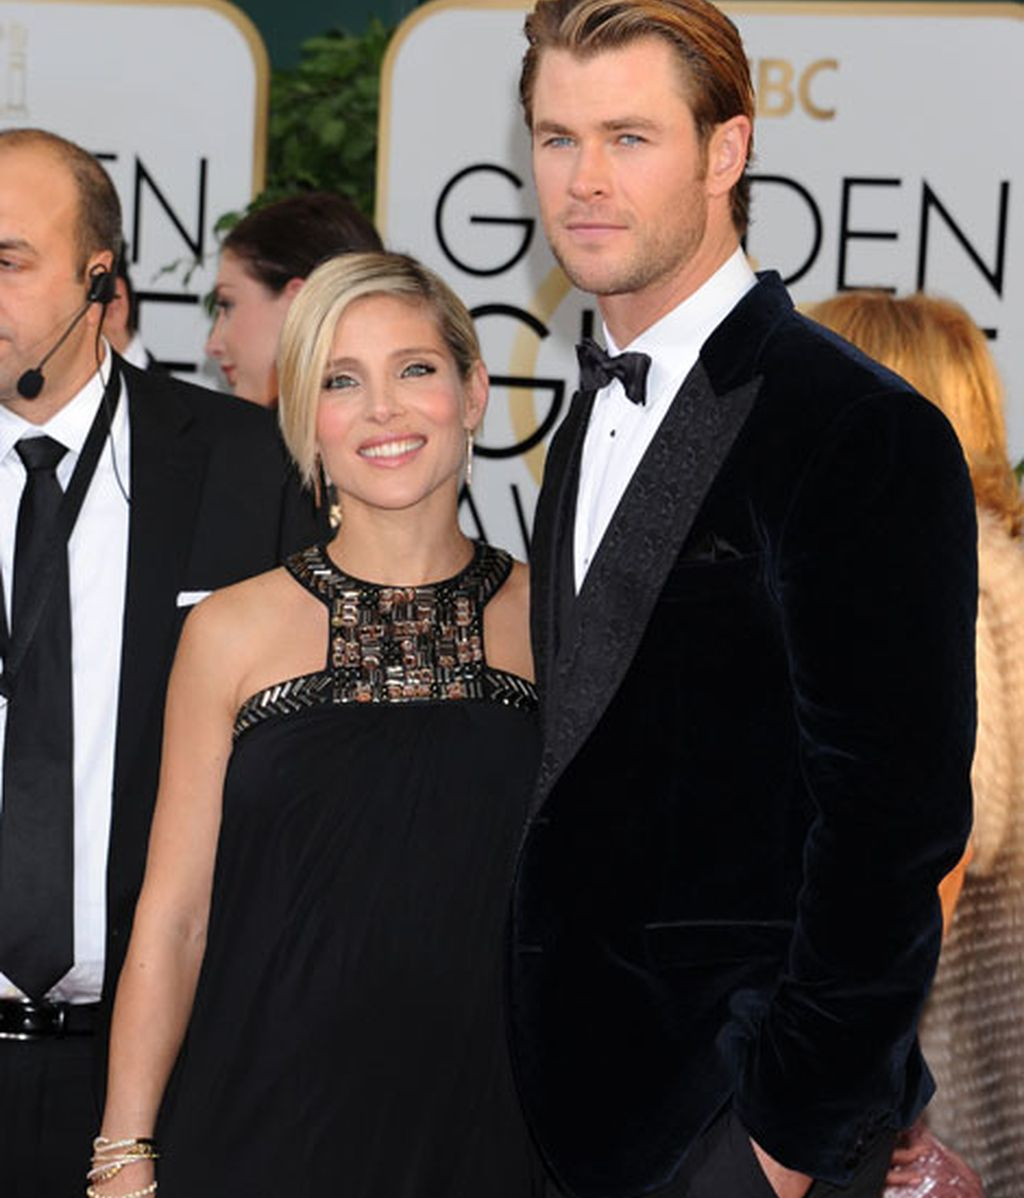 Elsa Pataky, junto a su marido Chris Hemsworth, luce un elegante Paul K